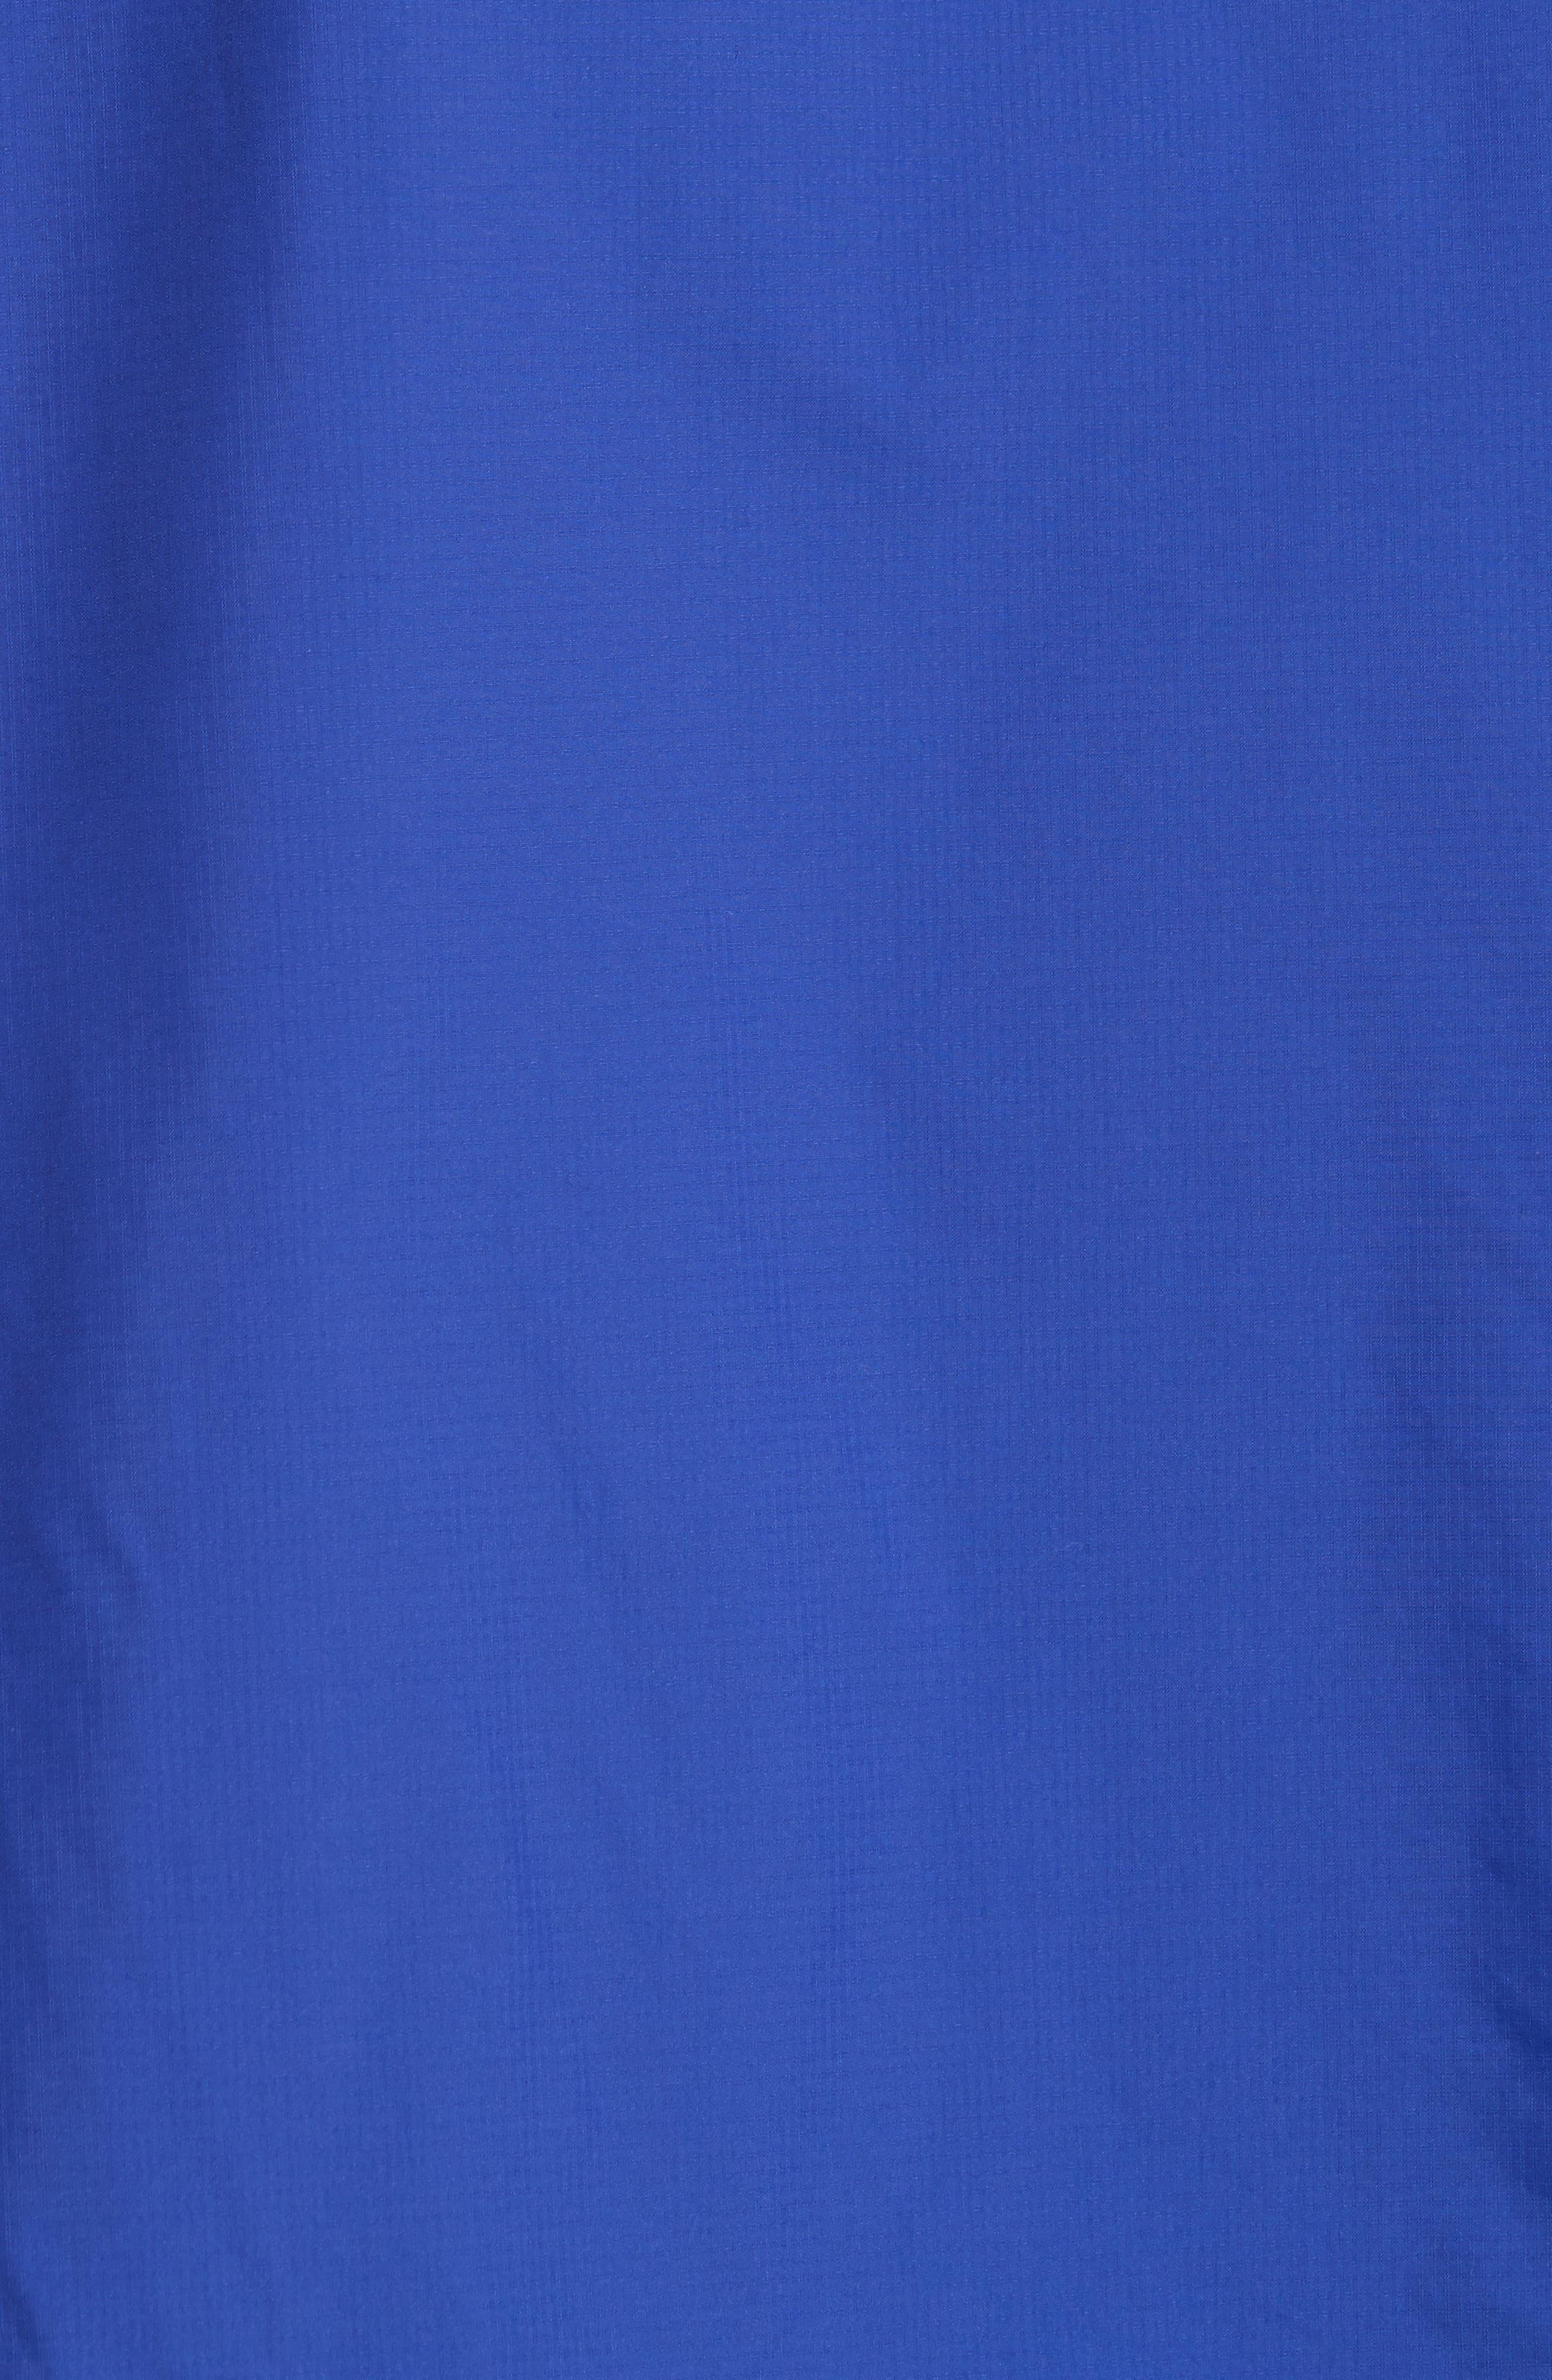 Unisex Rain Poncho,                             Alternate thumbnail 11, color,                             Lapis Blue